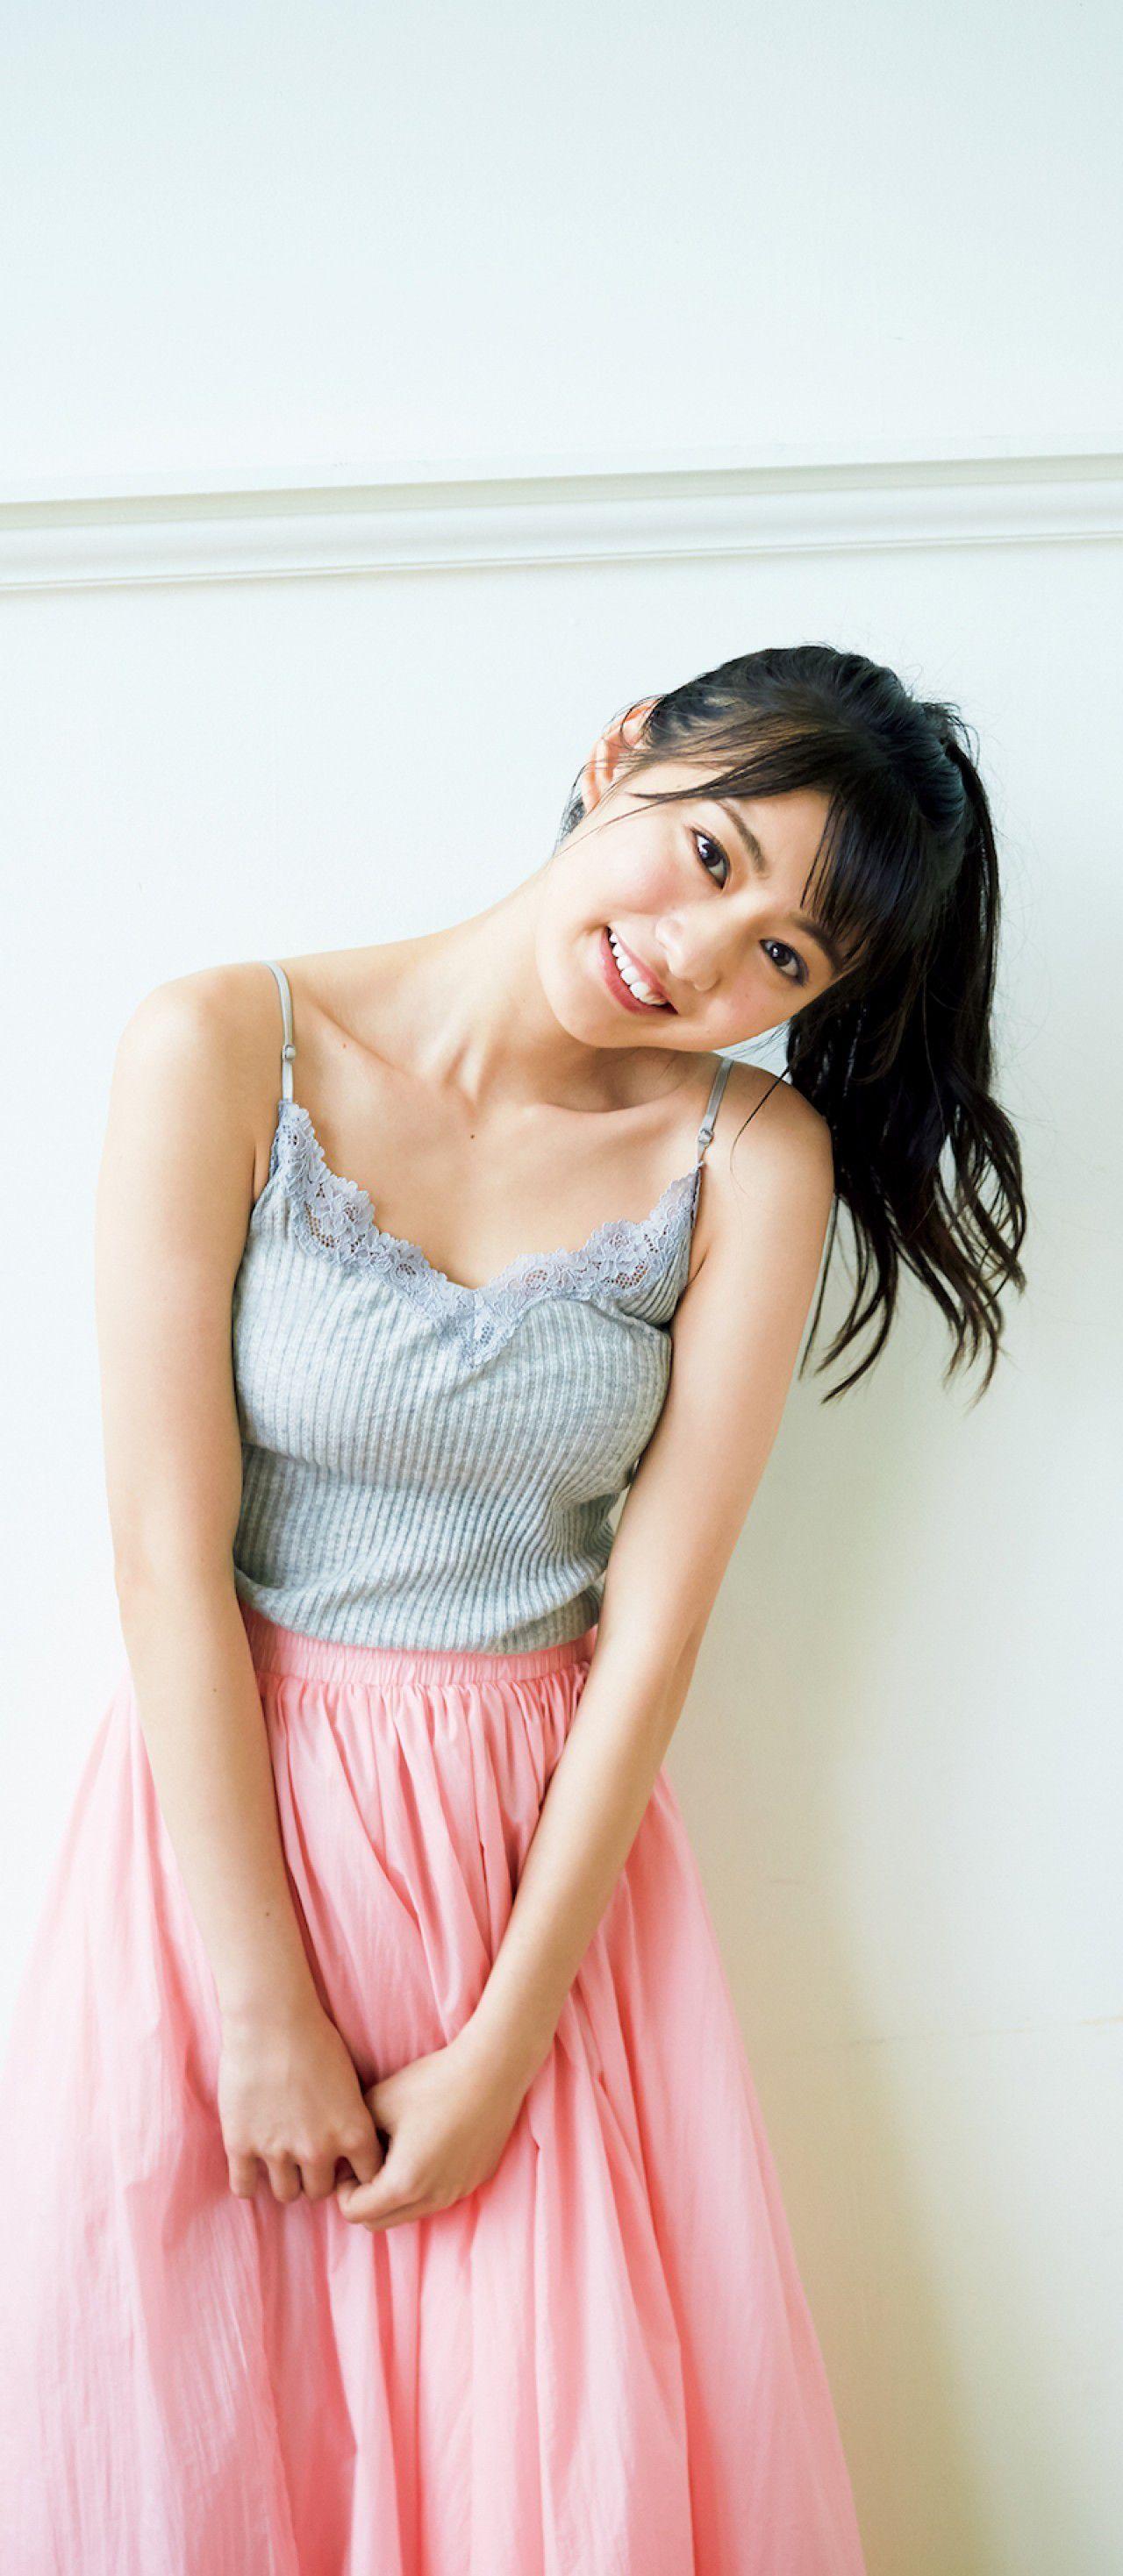 Yasuko Koga, a pure and innocent girl from The Last Idol003